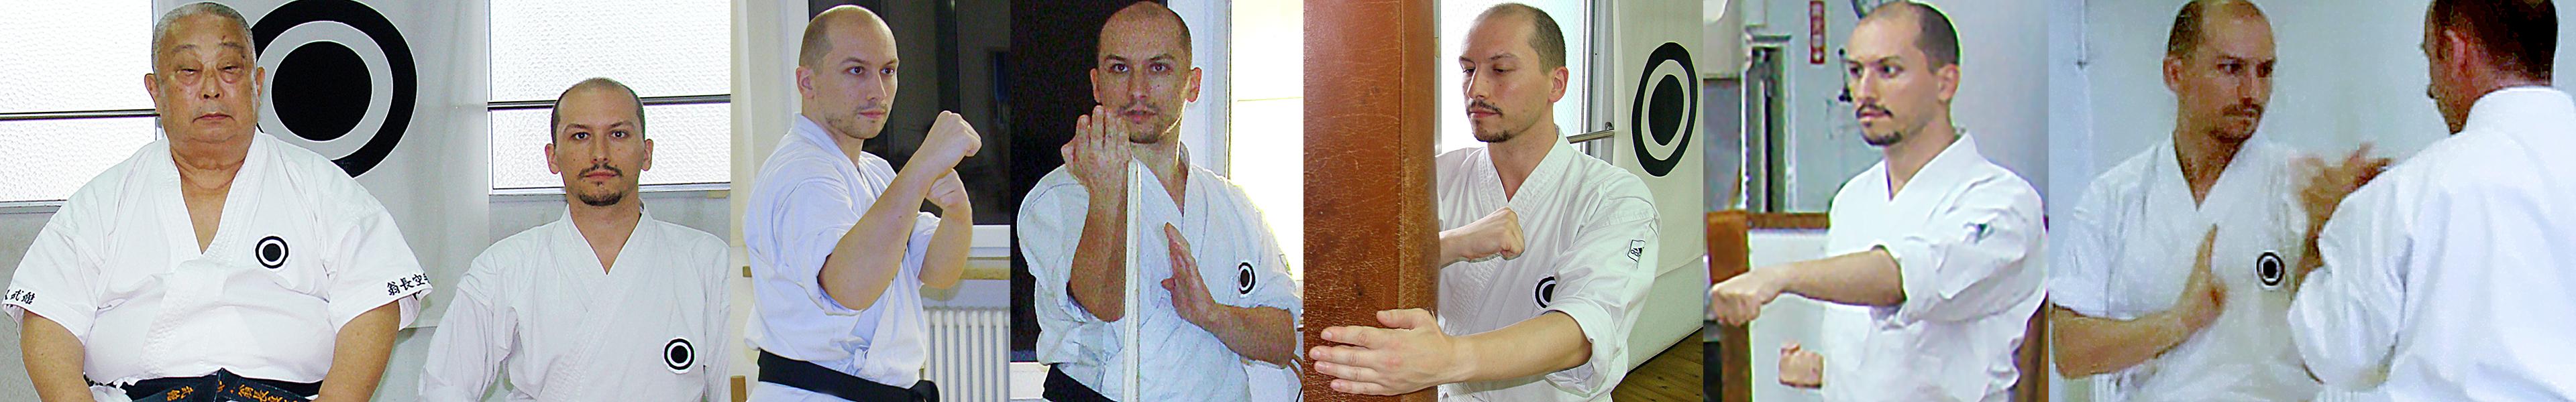 Shinjinbukan.com -  Theme Collage: Ludovic Soler 1